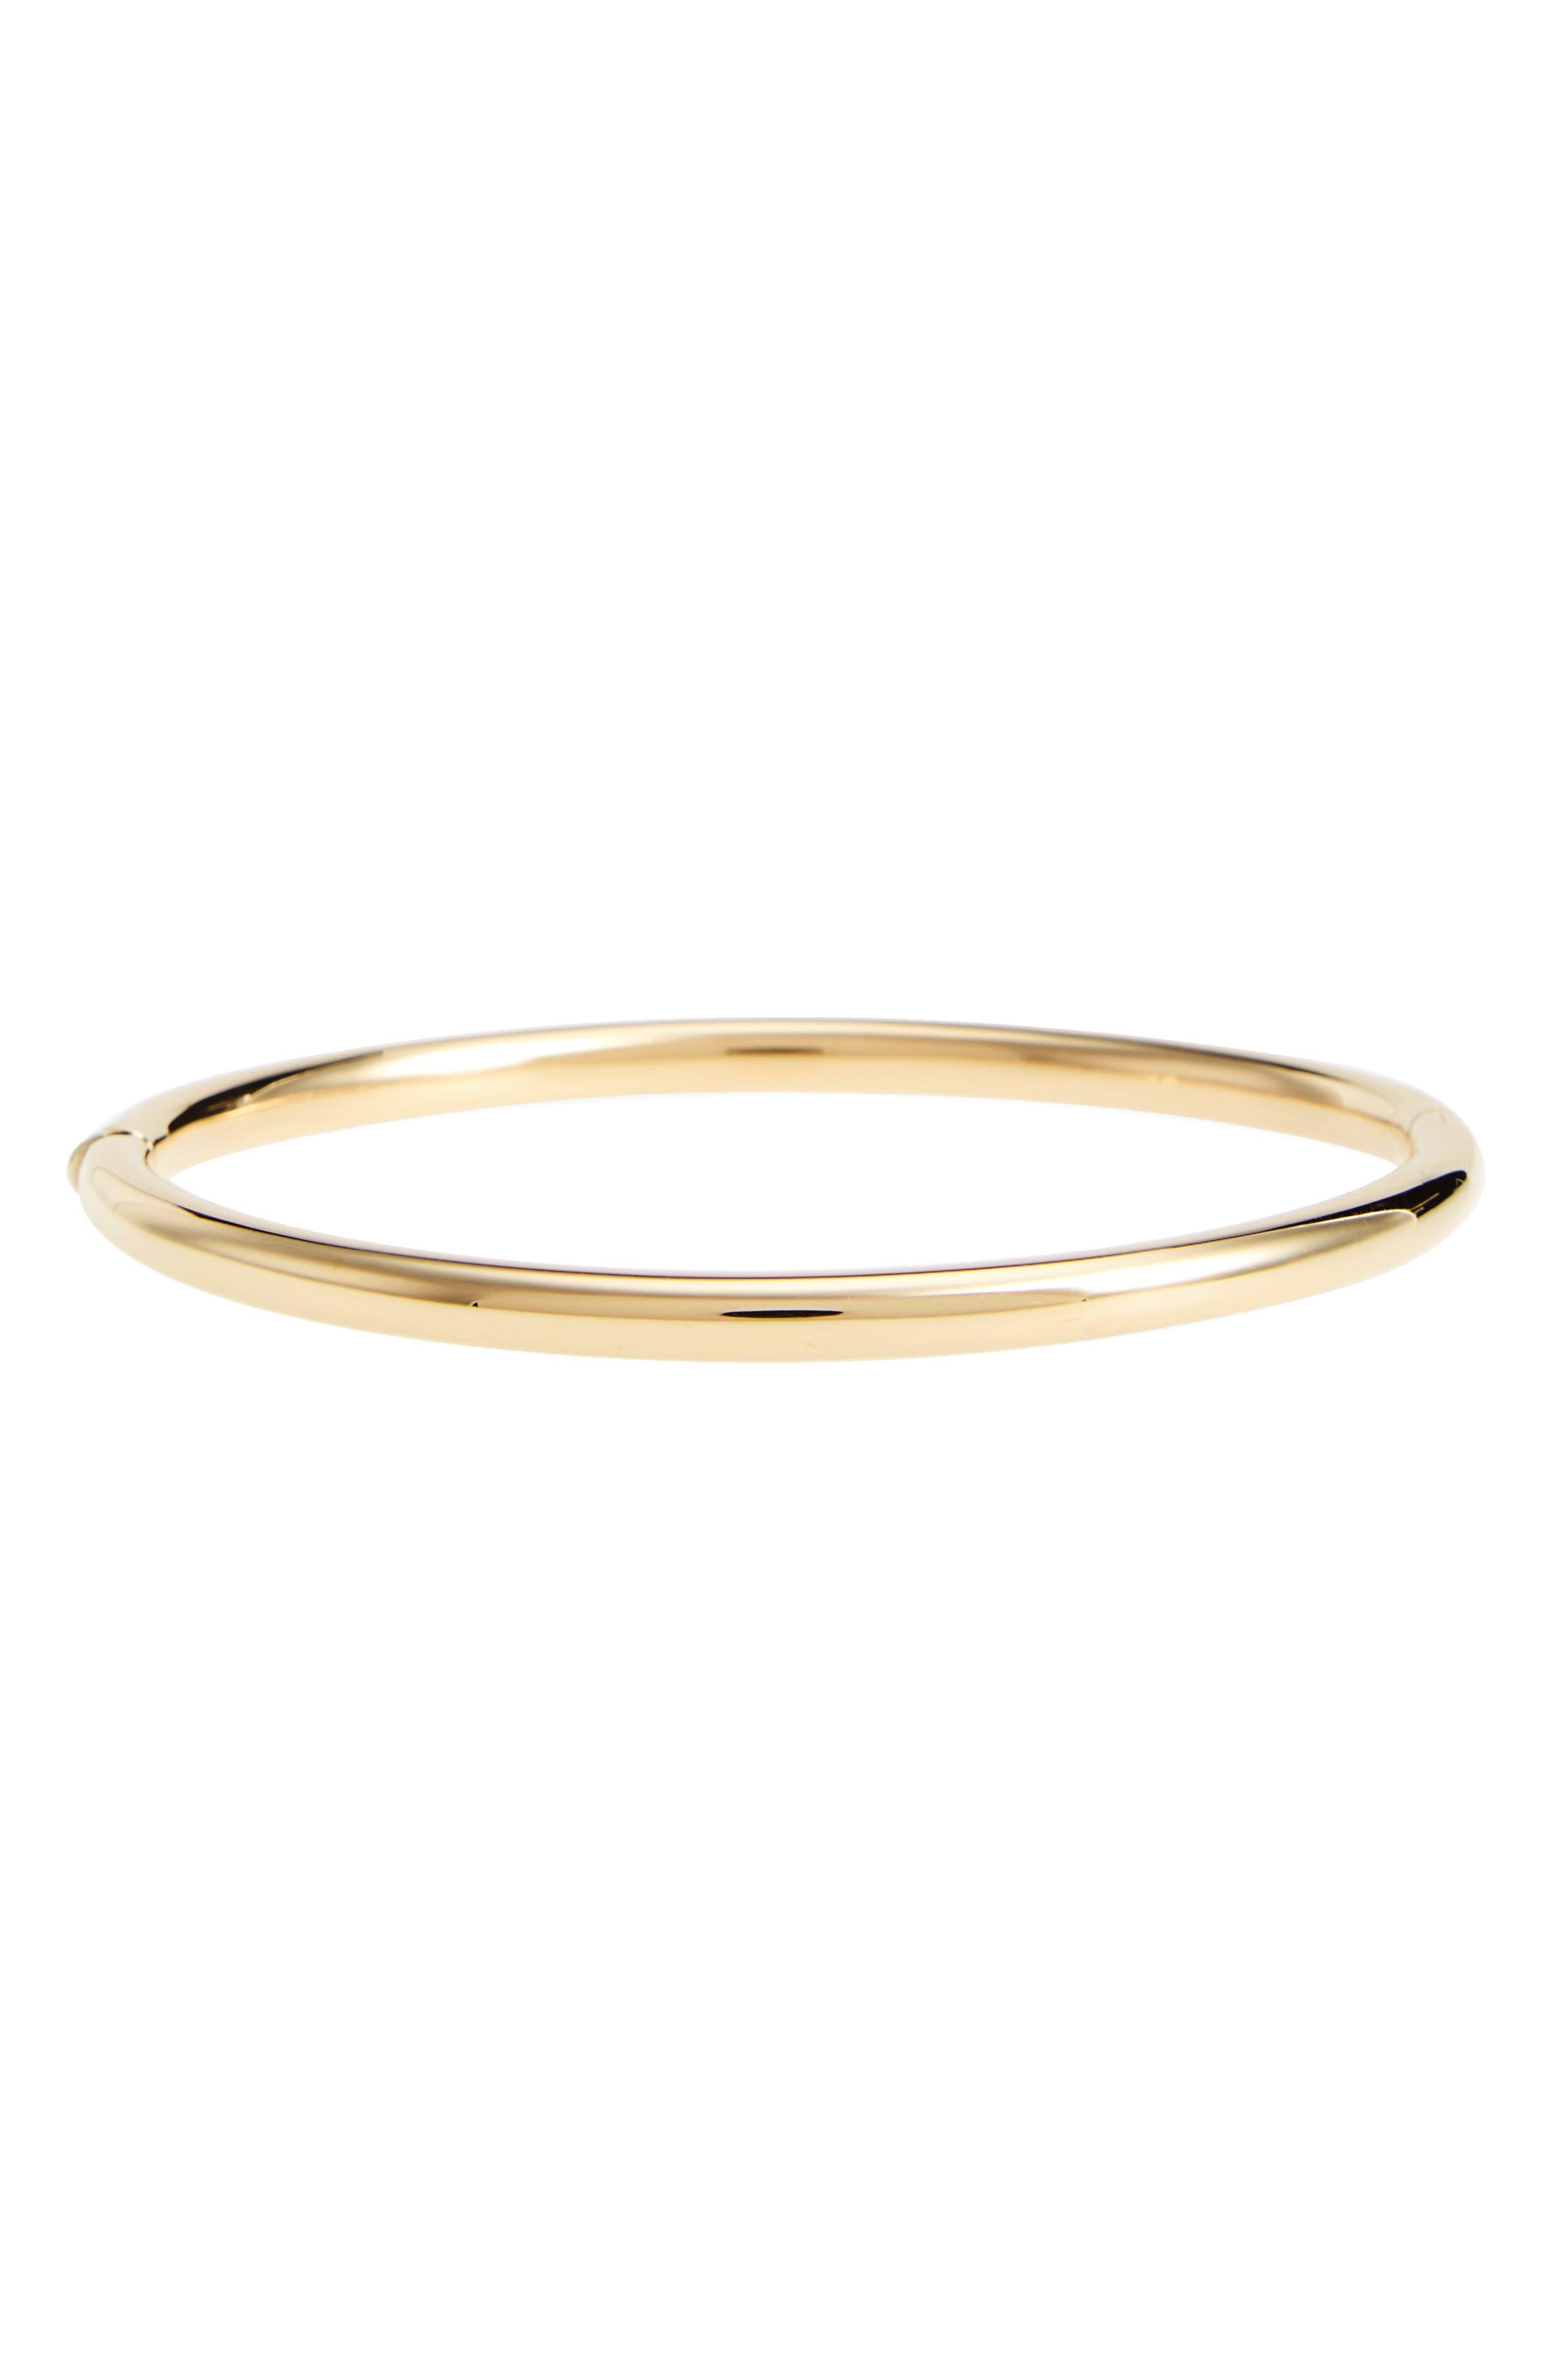 Slim Bangle Bracelet,                             Main thumbnail 1, color,                             Yellow Gold